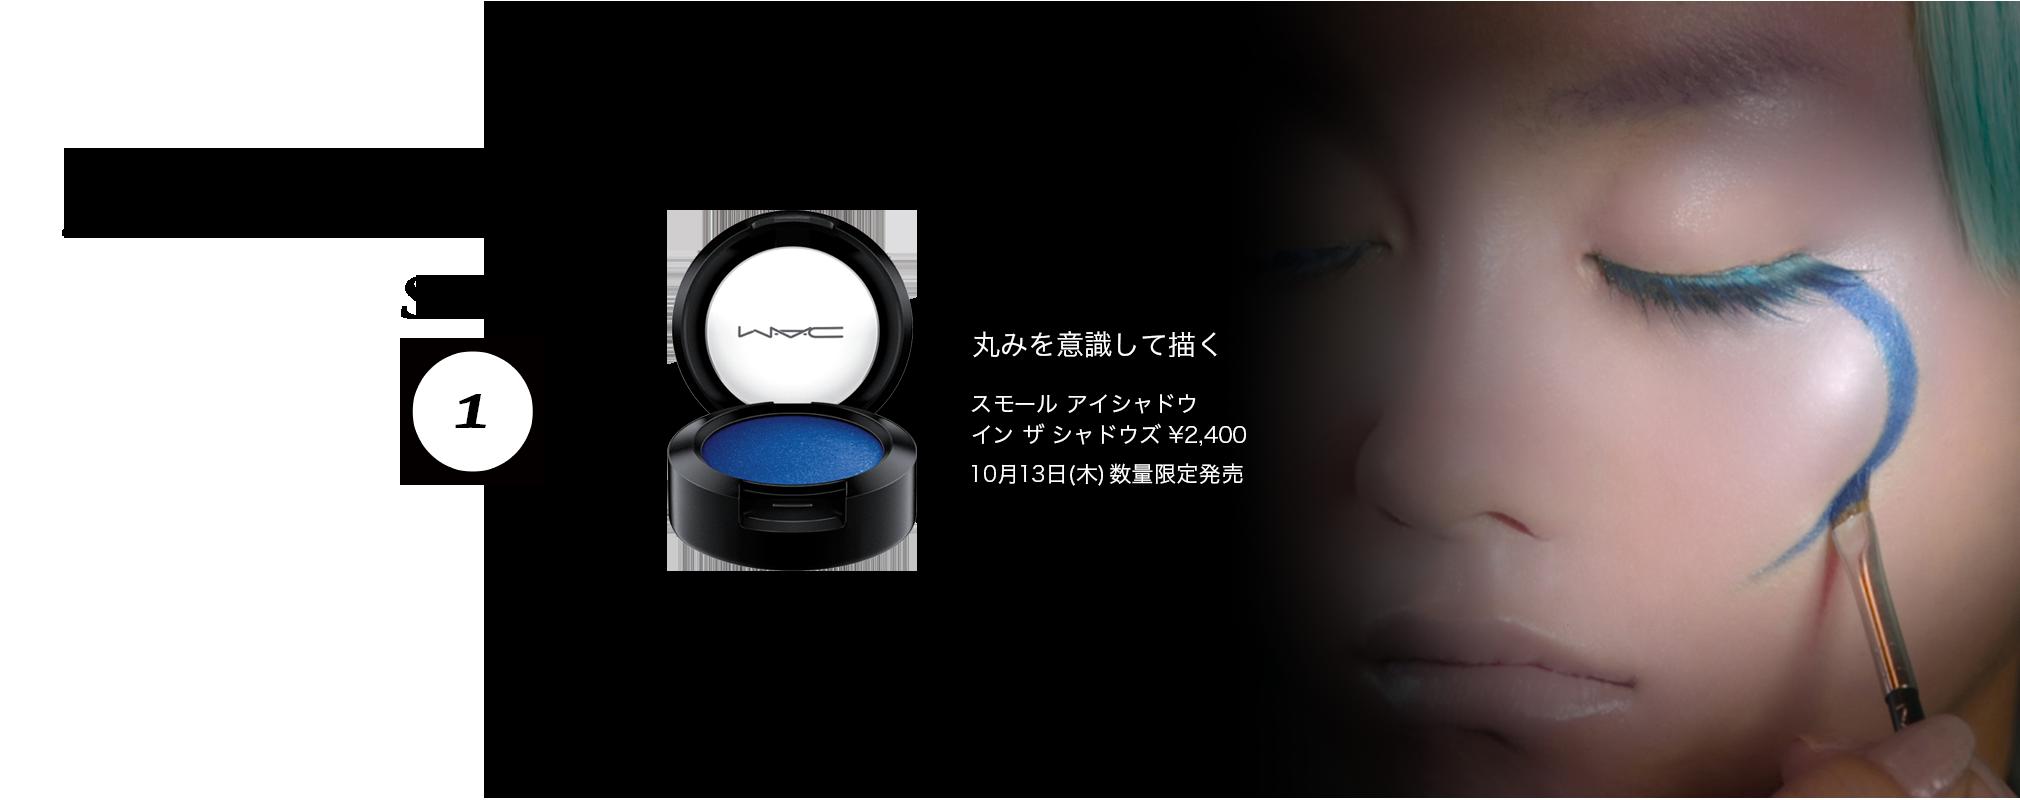 HOW TO STEP1 プロ ロングウェア フルイッドライン ブラックトラック ¥2,500